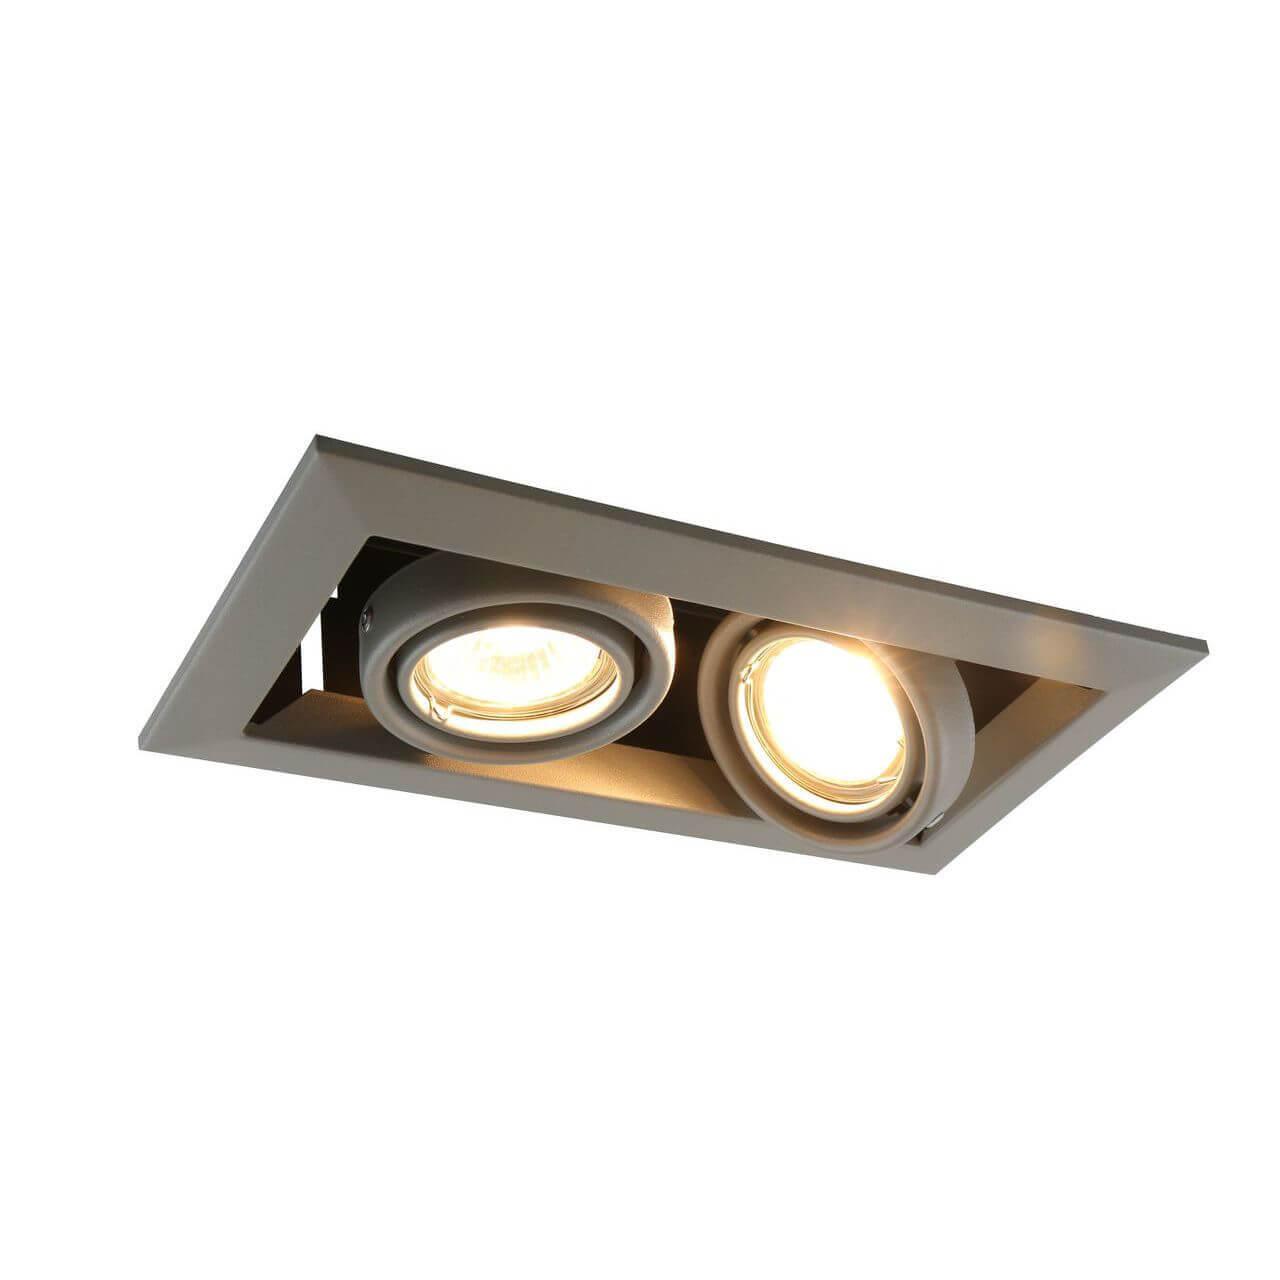 Встраиваемый светильник Arte Lamp Cardani Piccolo A5941PL-2GY arte lamp встраиваемый светильник arte lamp cardani silver a5941pl 4si